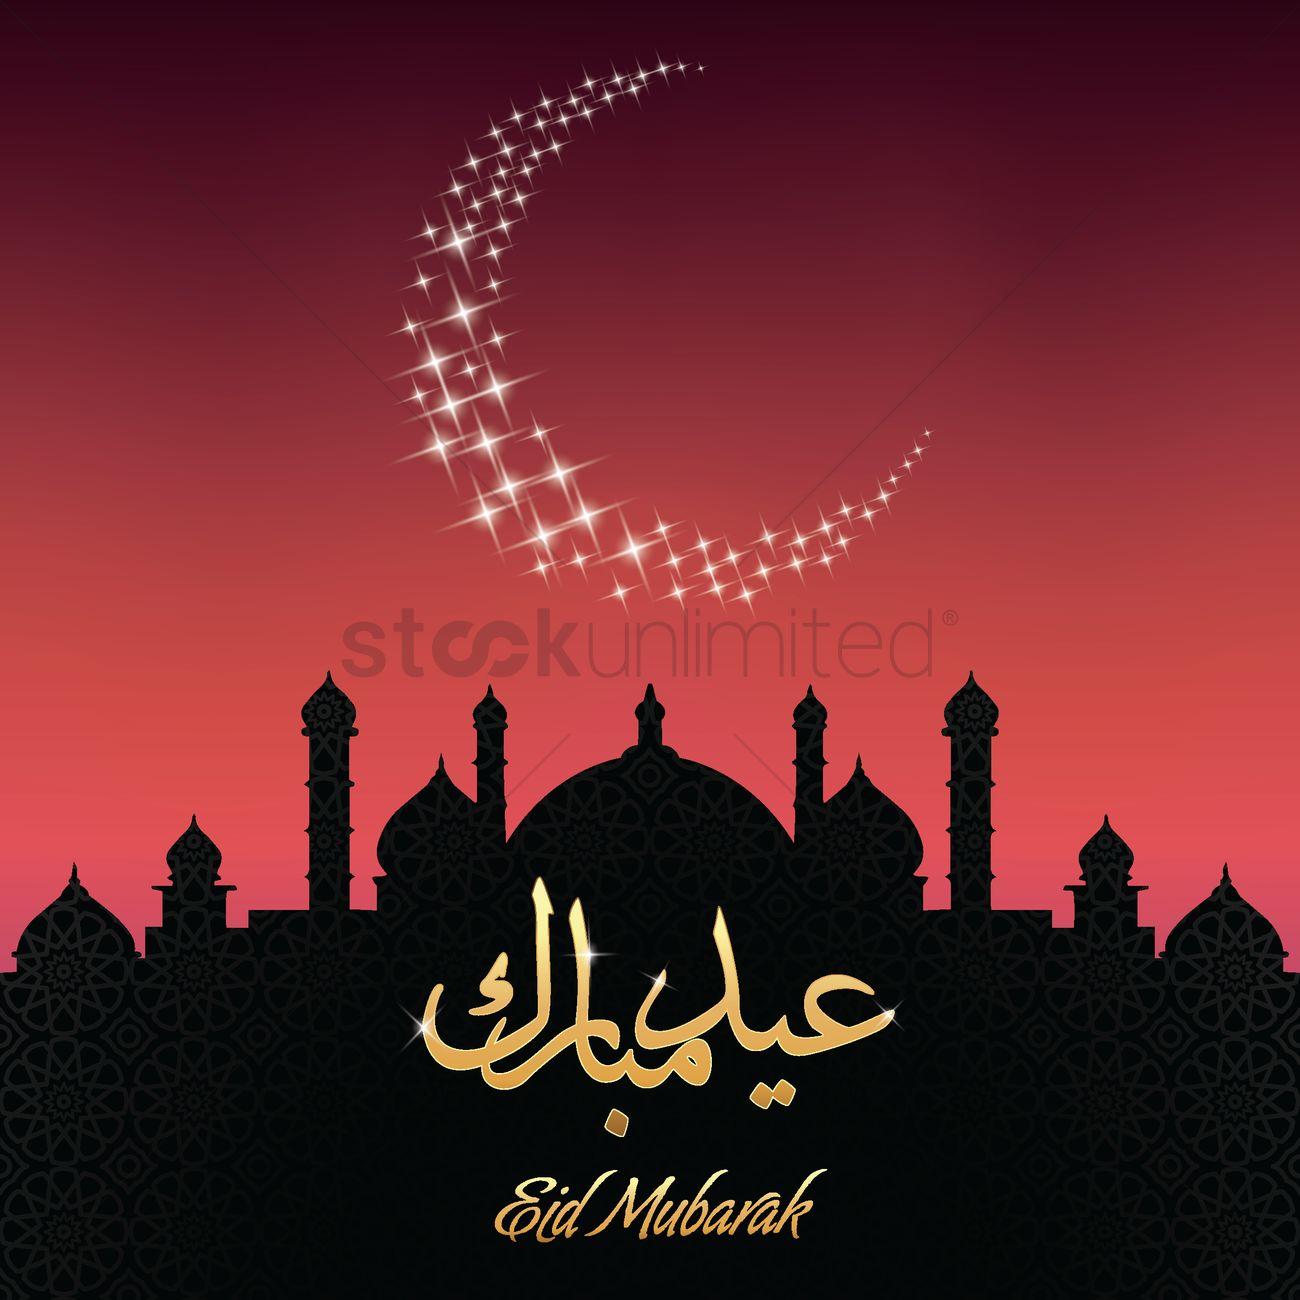 eid mubarak greeting vector image 1828292 stockunlimited